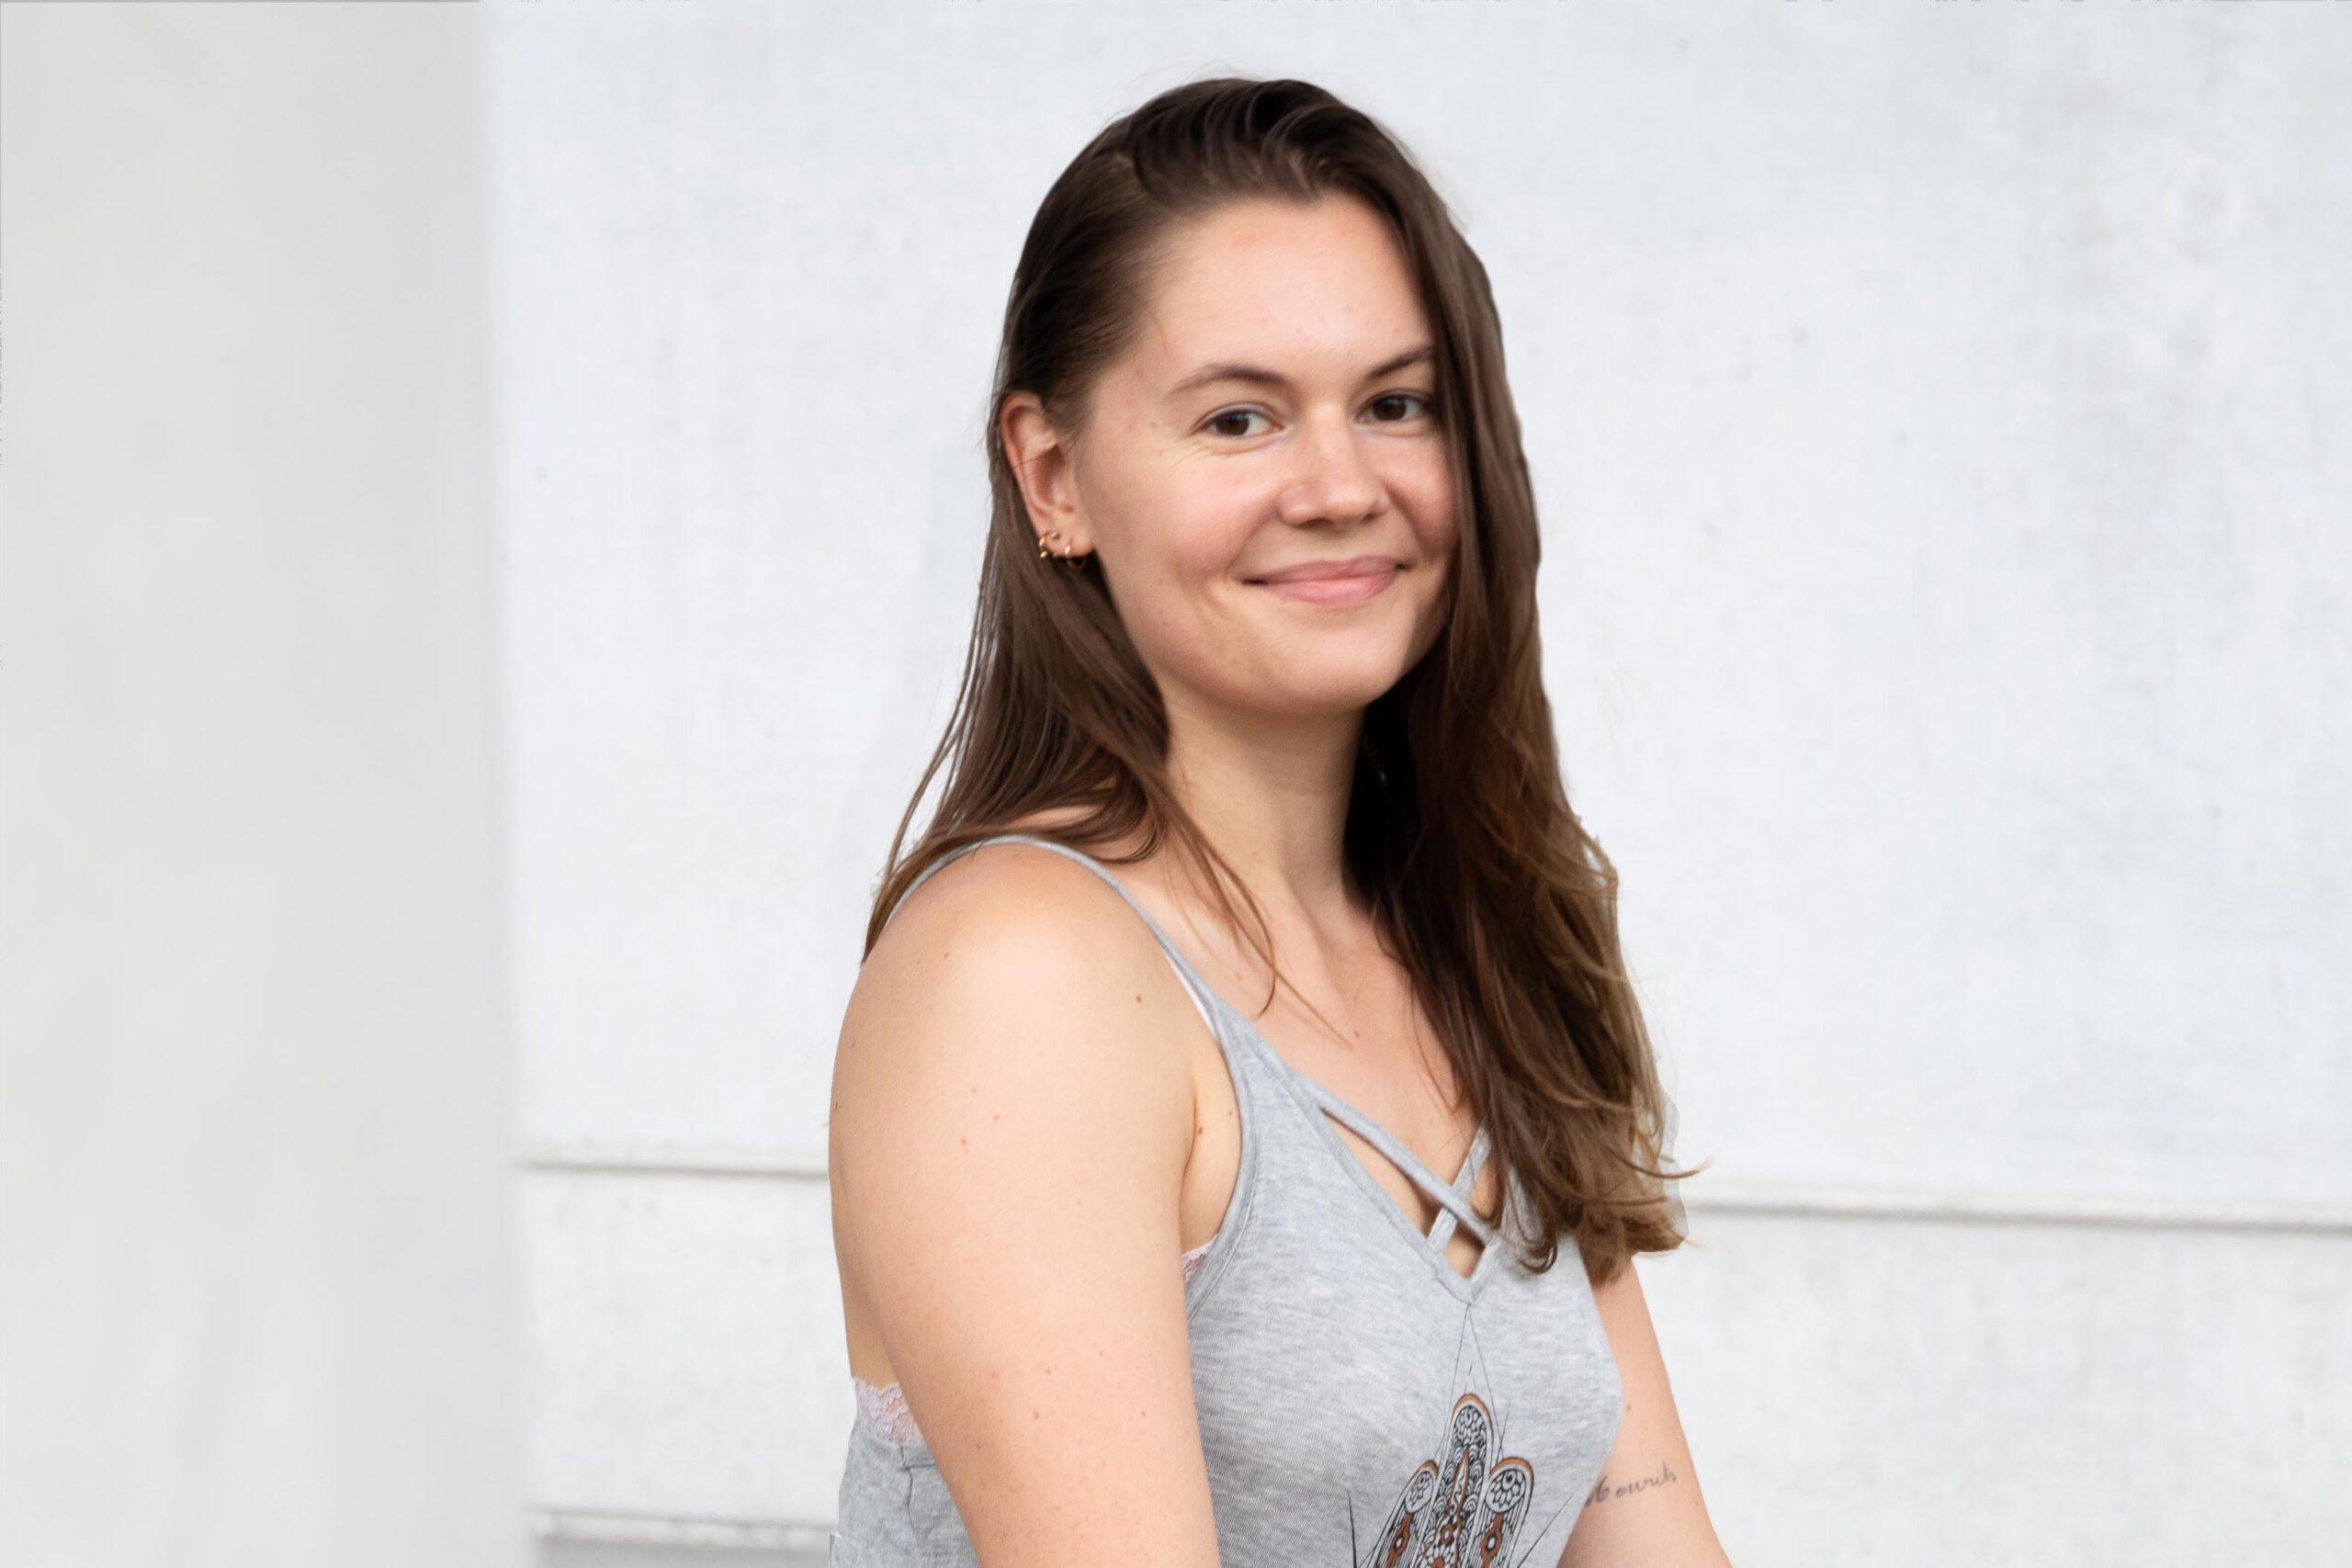 Isabelle Borinski